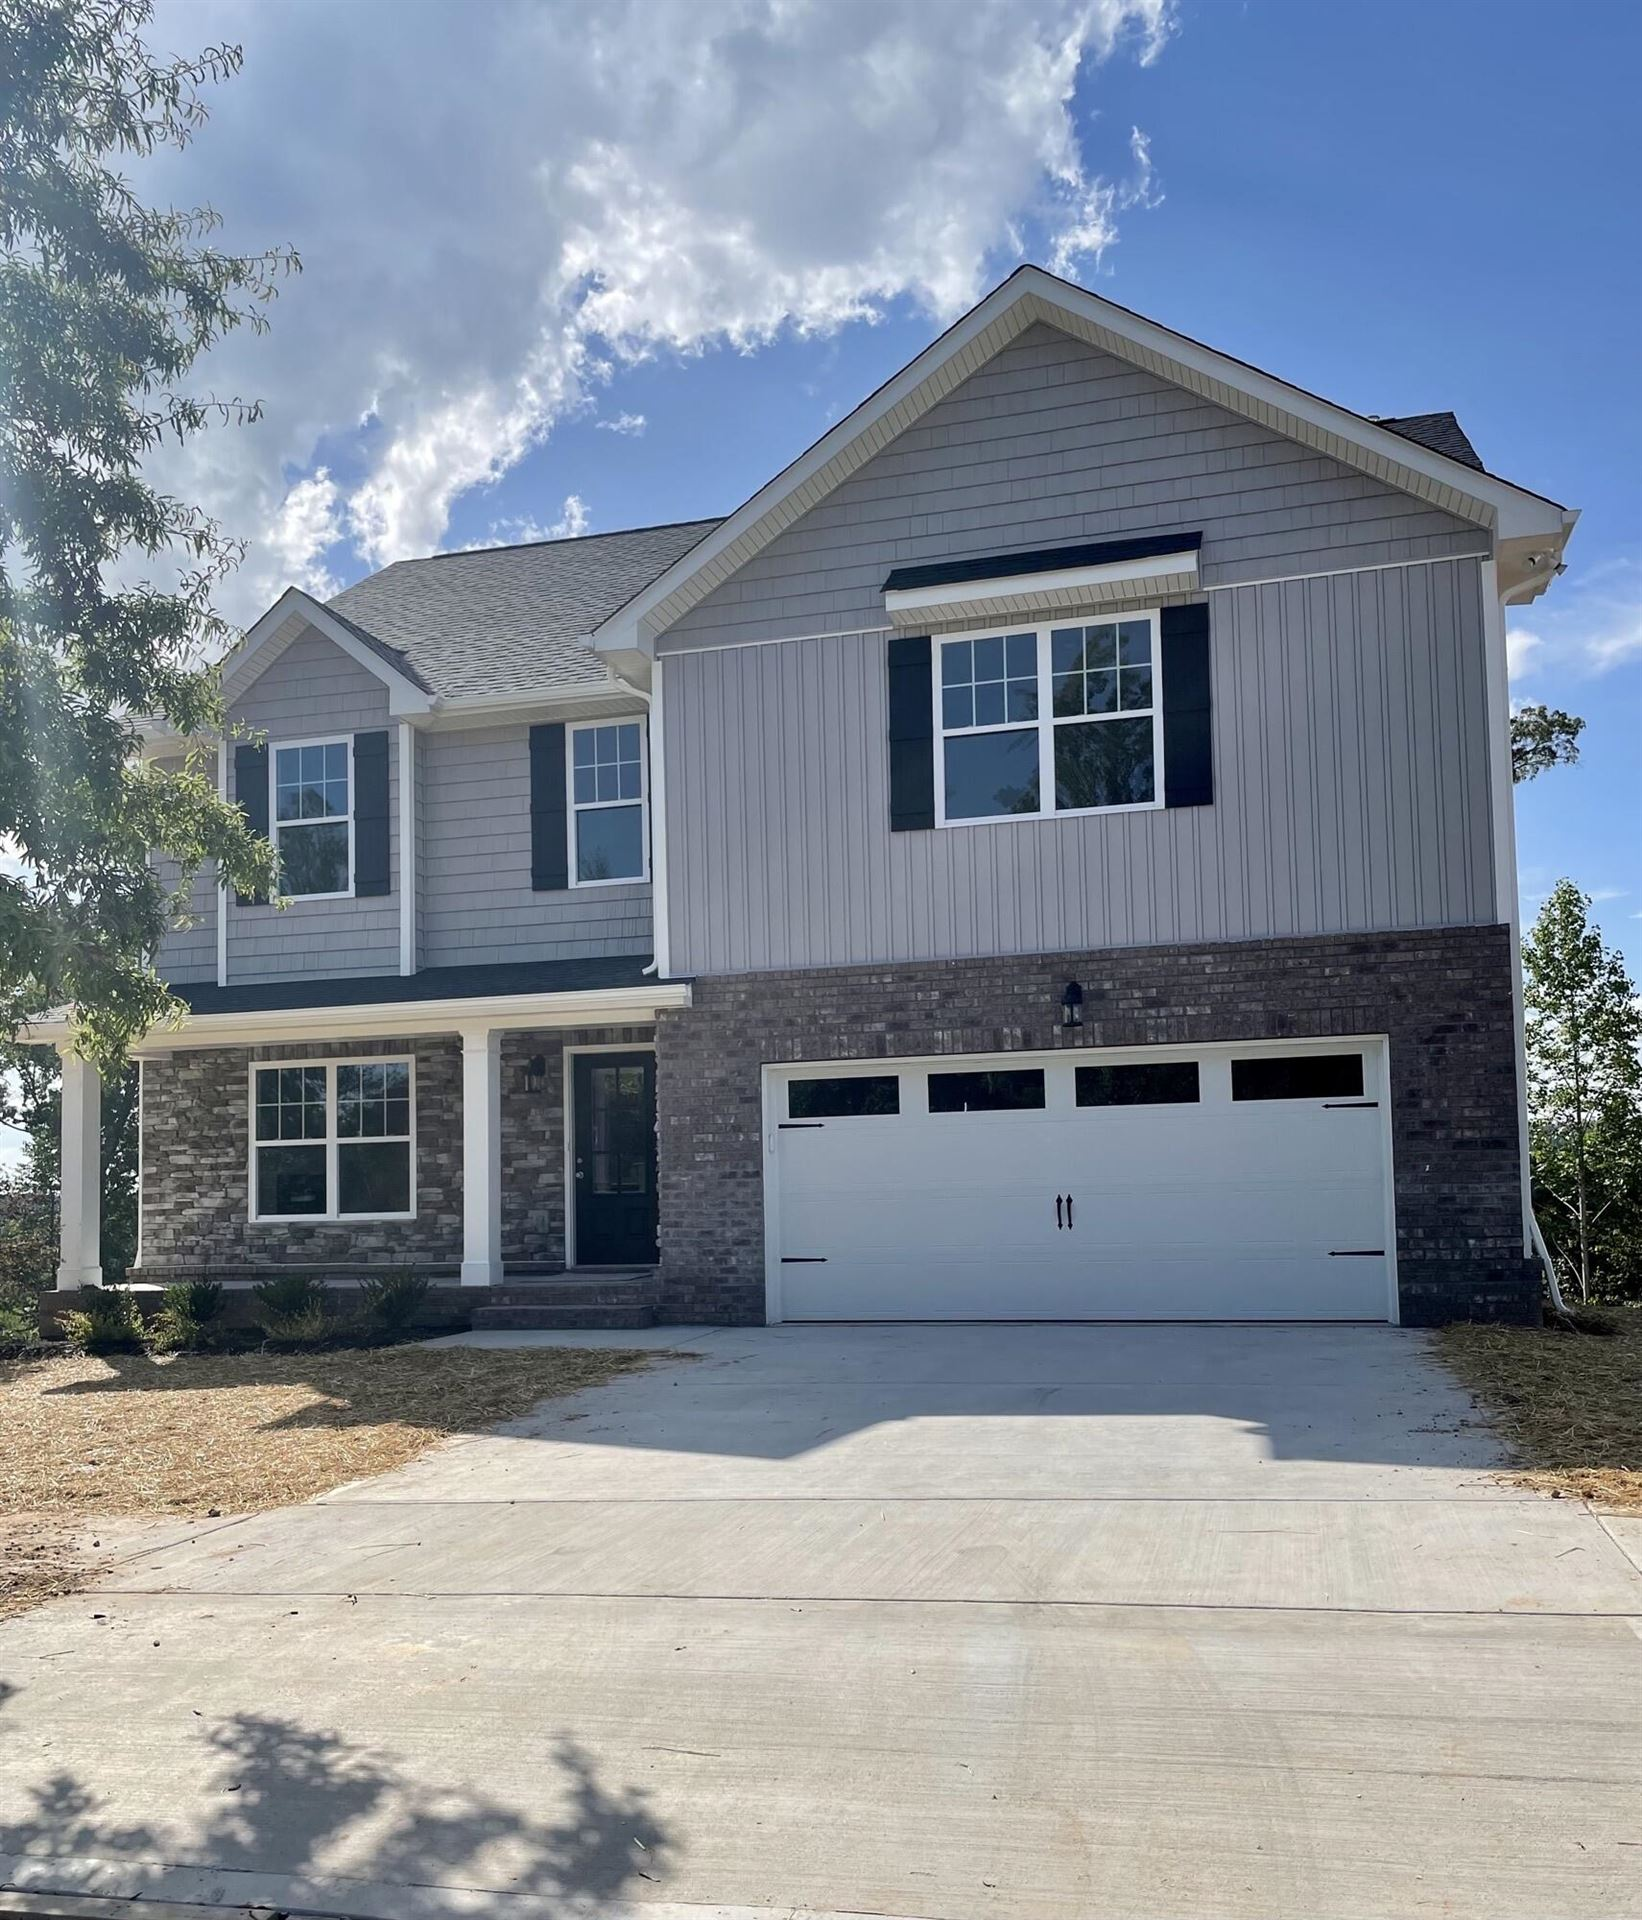 Photo of 109 Juniperberry Rd #Lot 602, Oak Ridge, TN 37830 (MLS # 1148629)